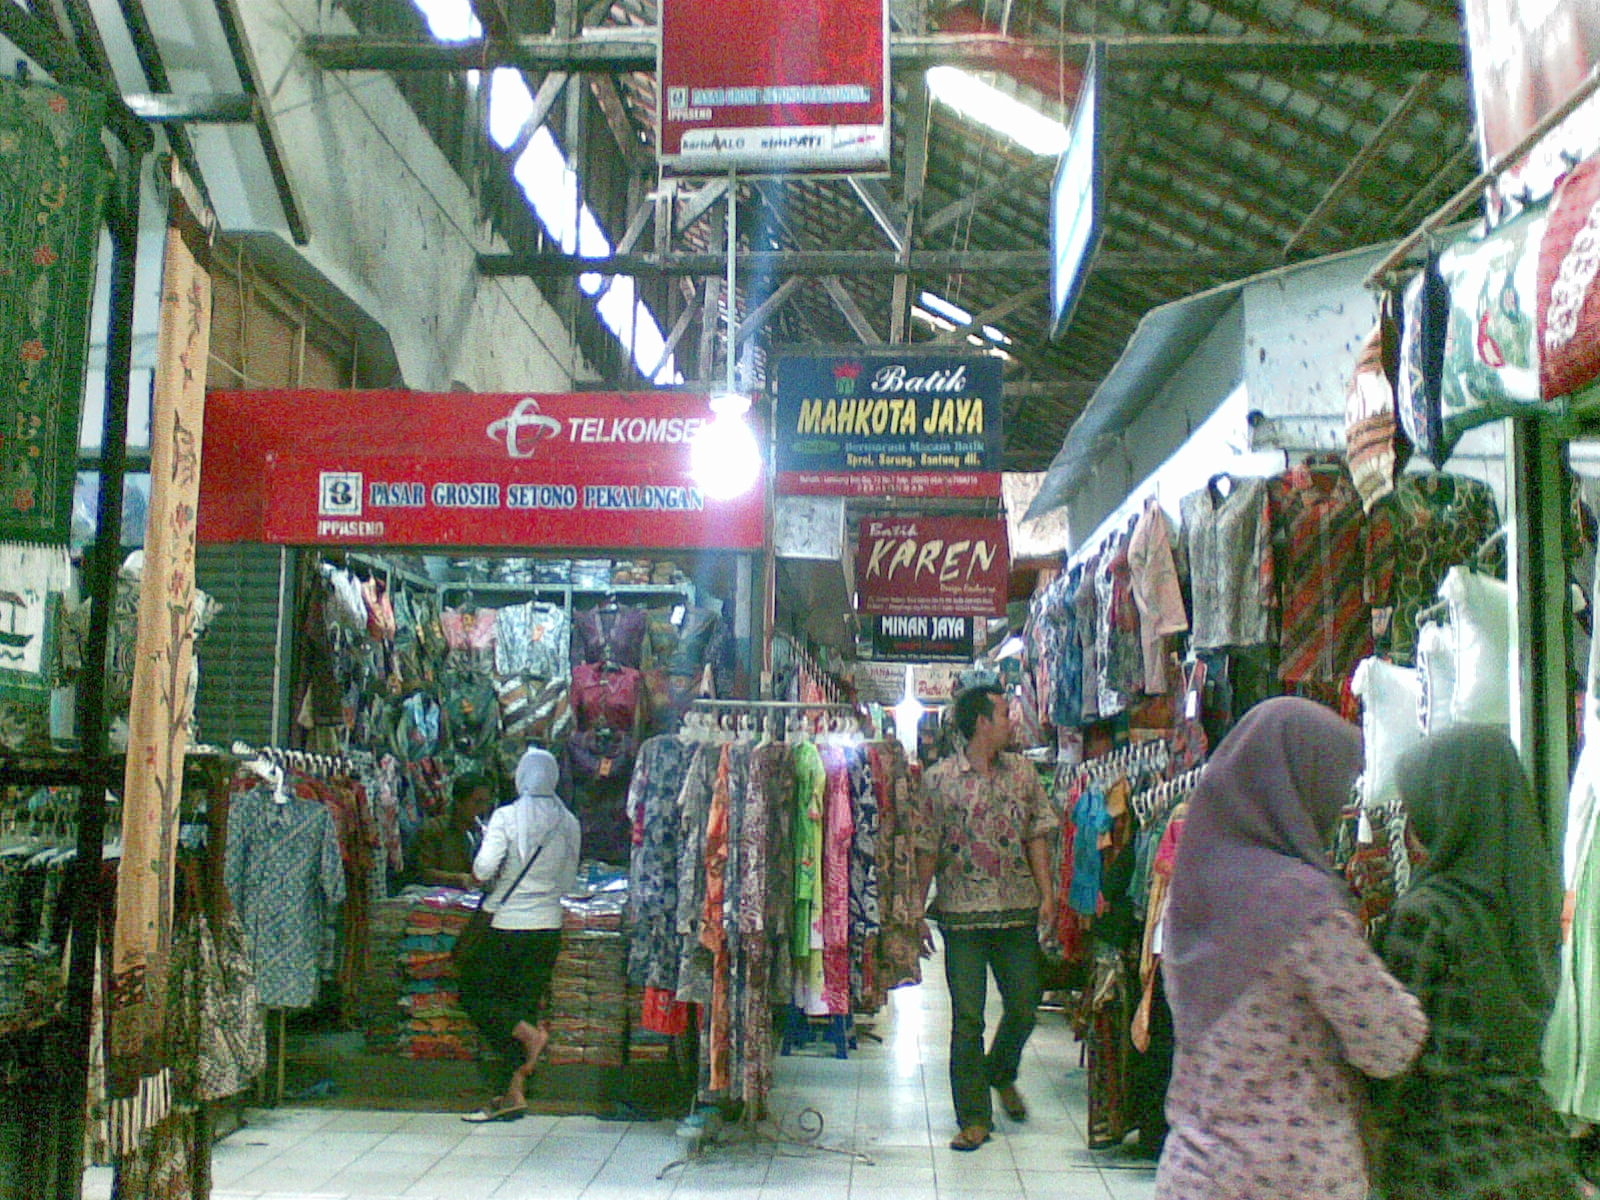 Pasar Grosir Setono dan IBC (International Batik Center) in ... 3f440e0be7